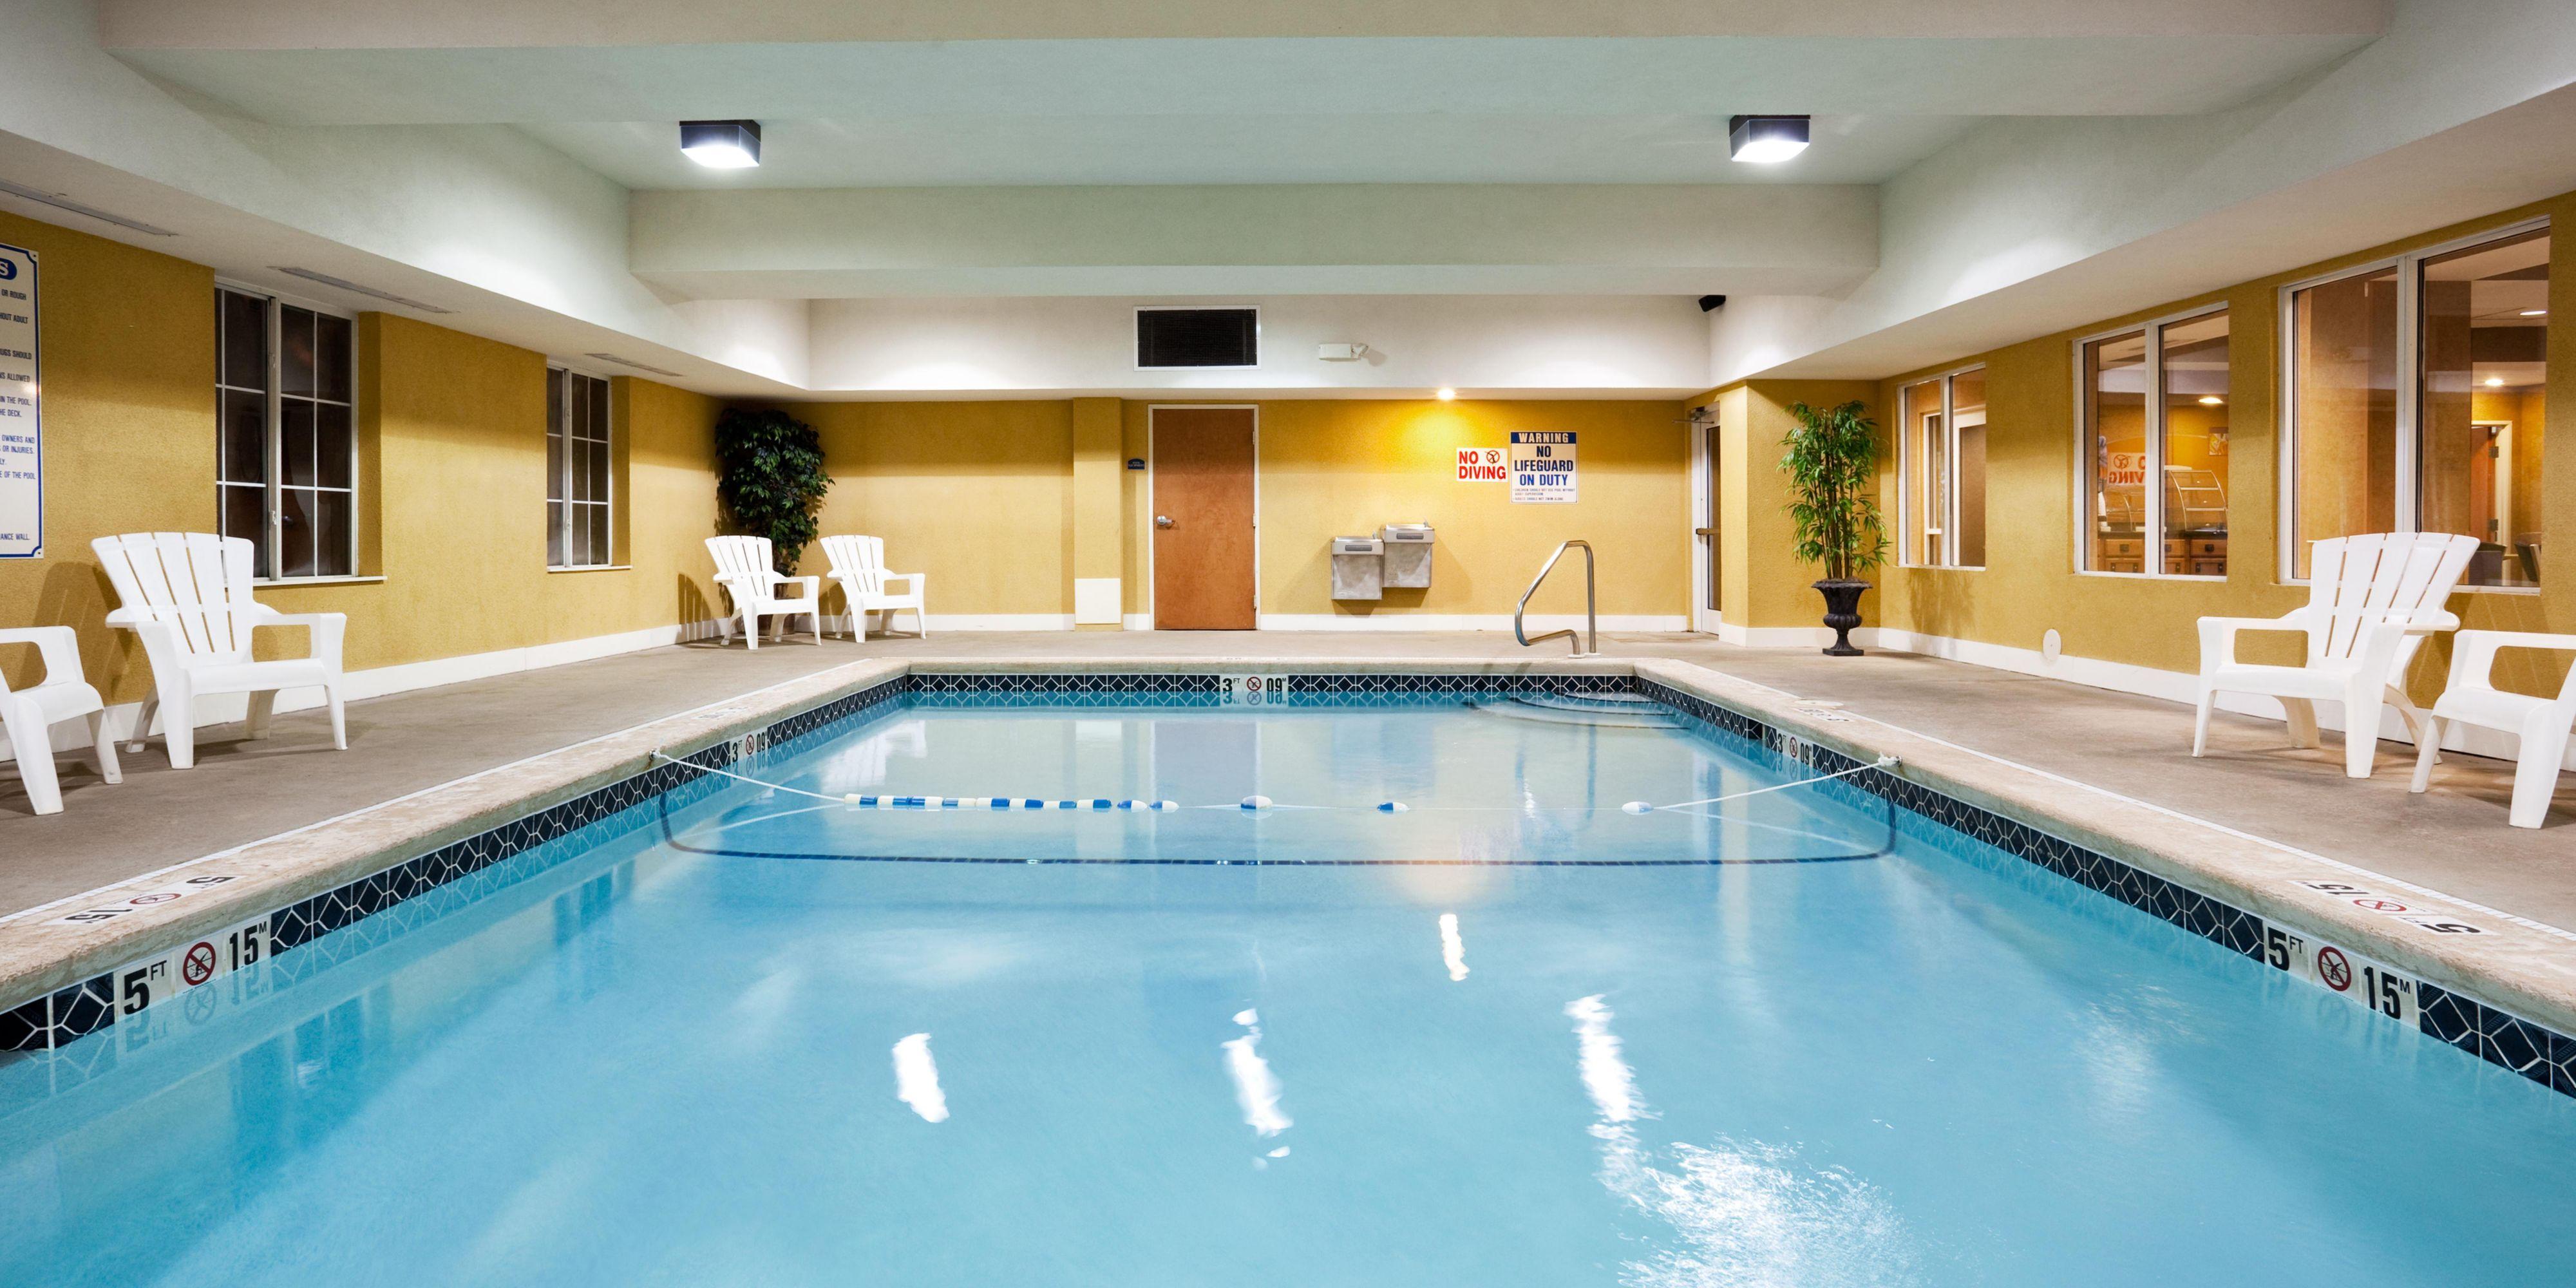 Holiday Inn Express Gastonia 4274279238 2x1